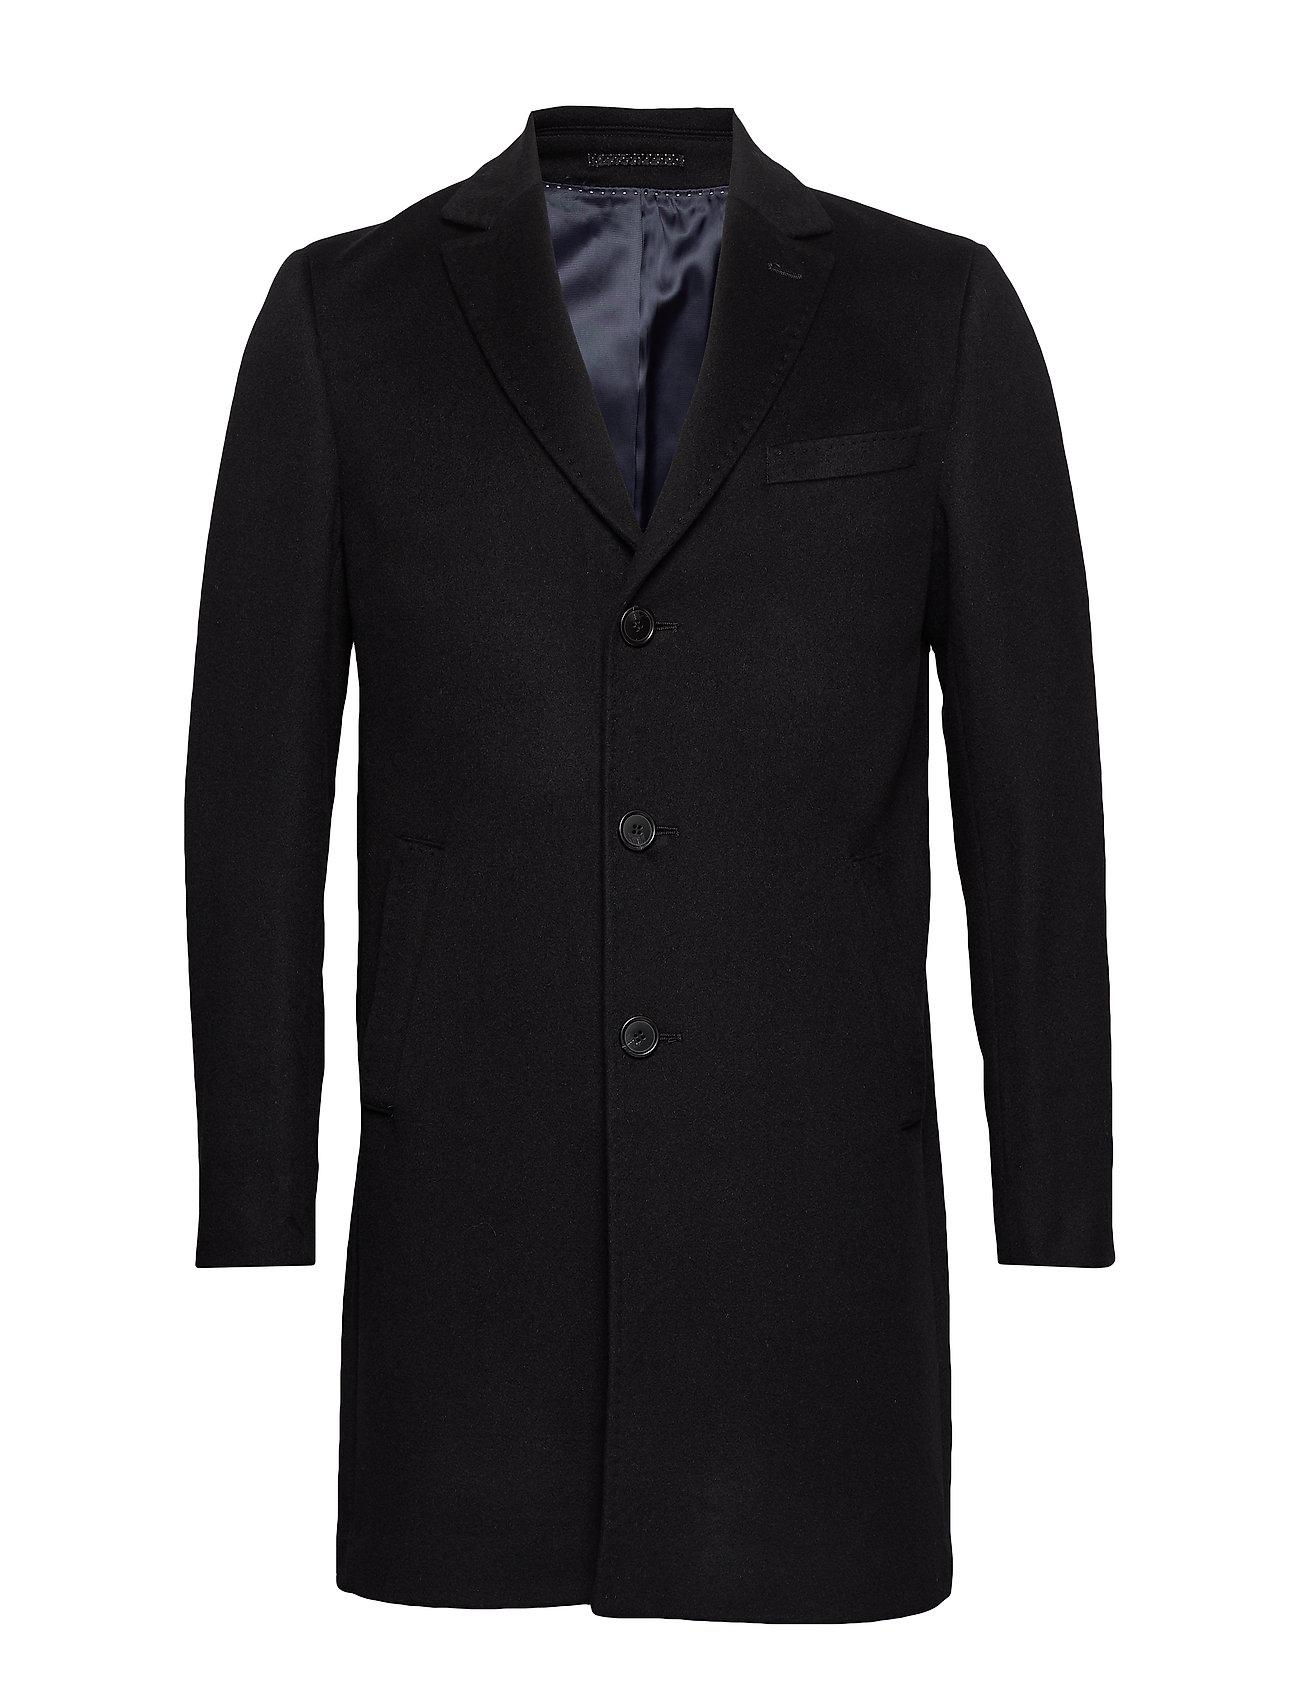 SAND Cashmere Coat - Sultan Relax - BLACK